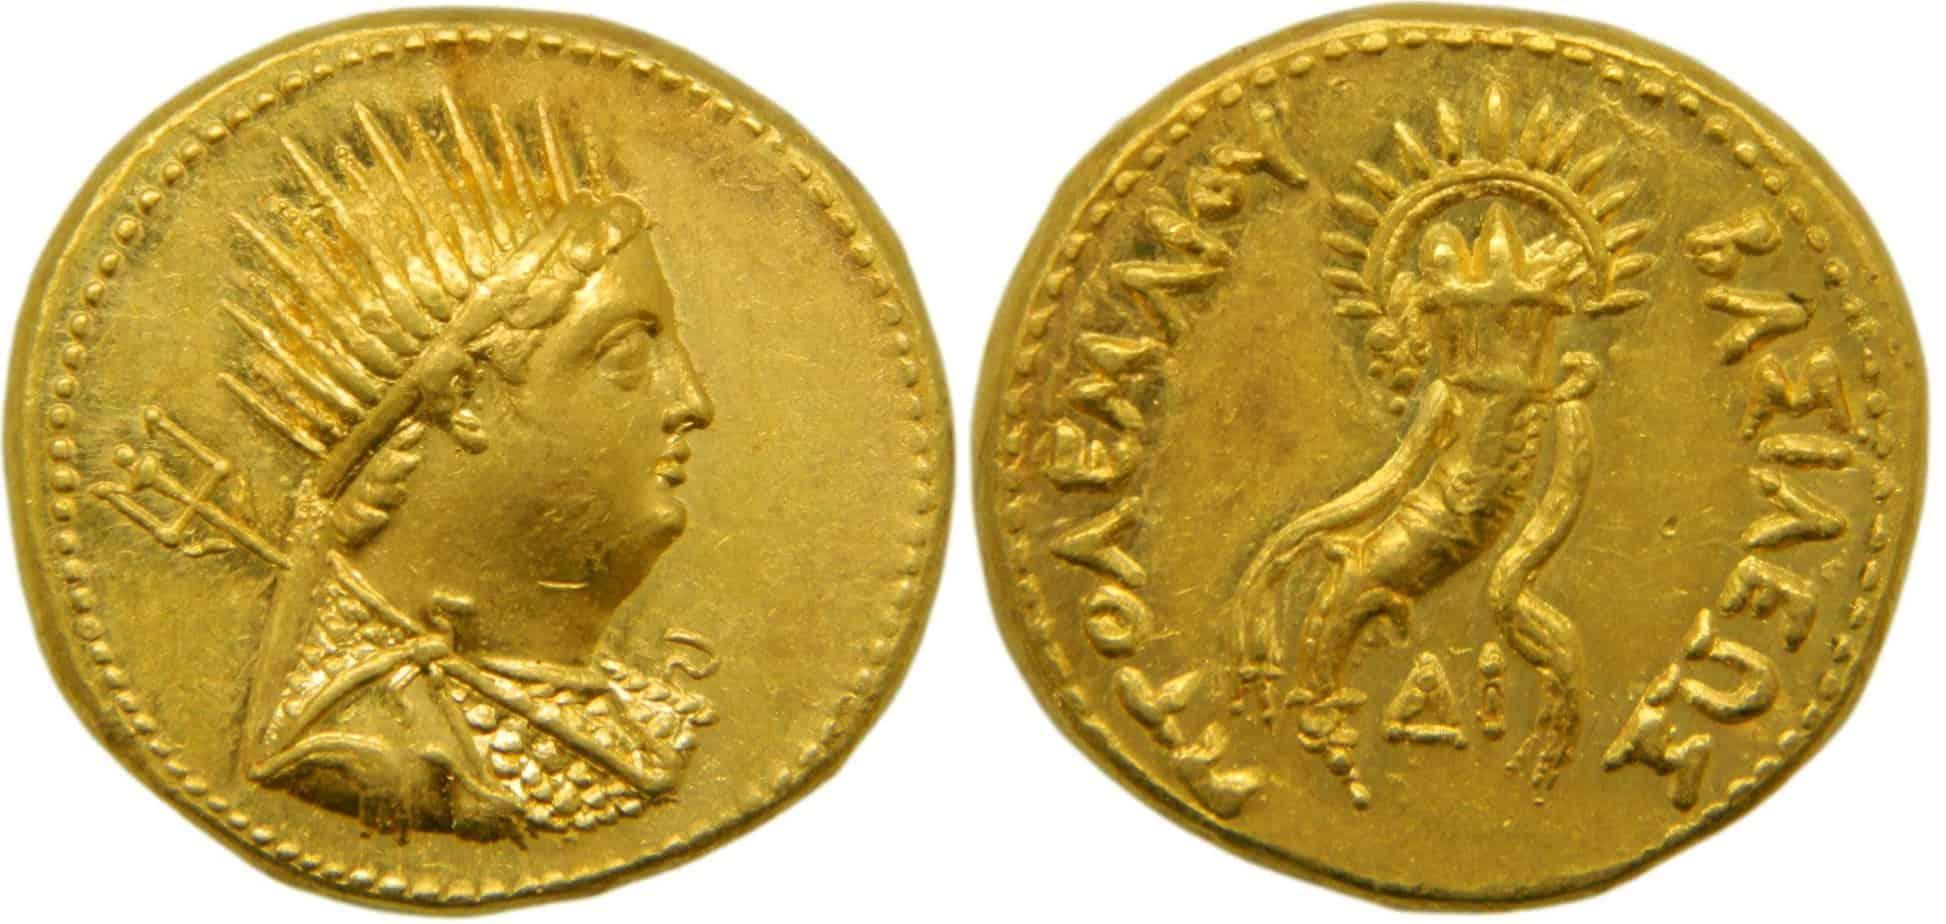 Octodracma de Ptolomeo IV